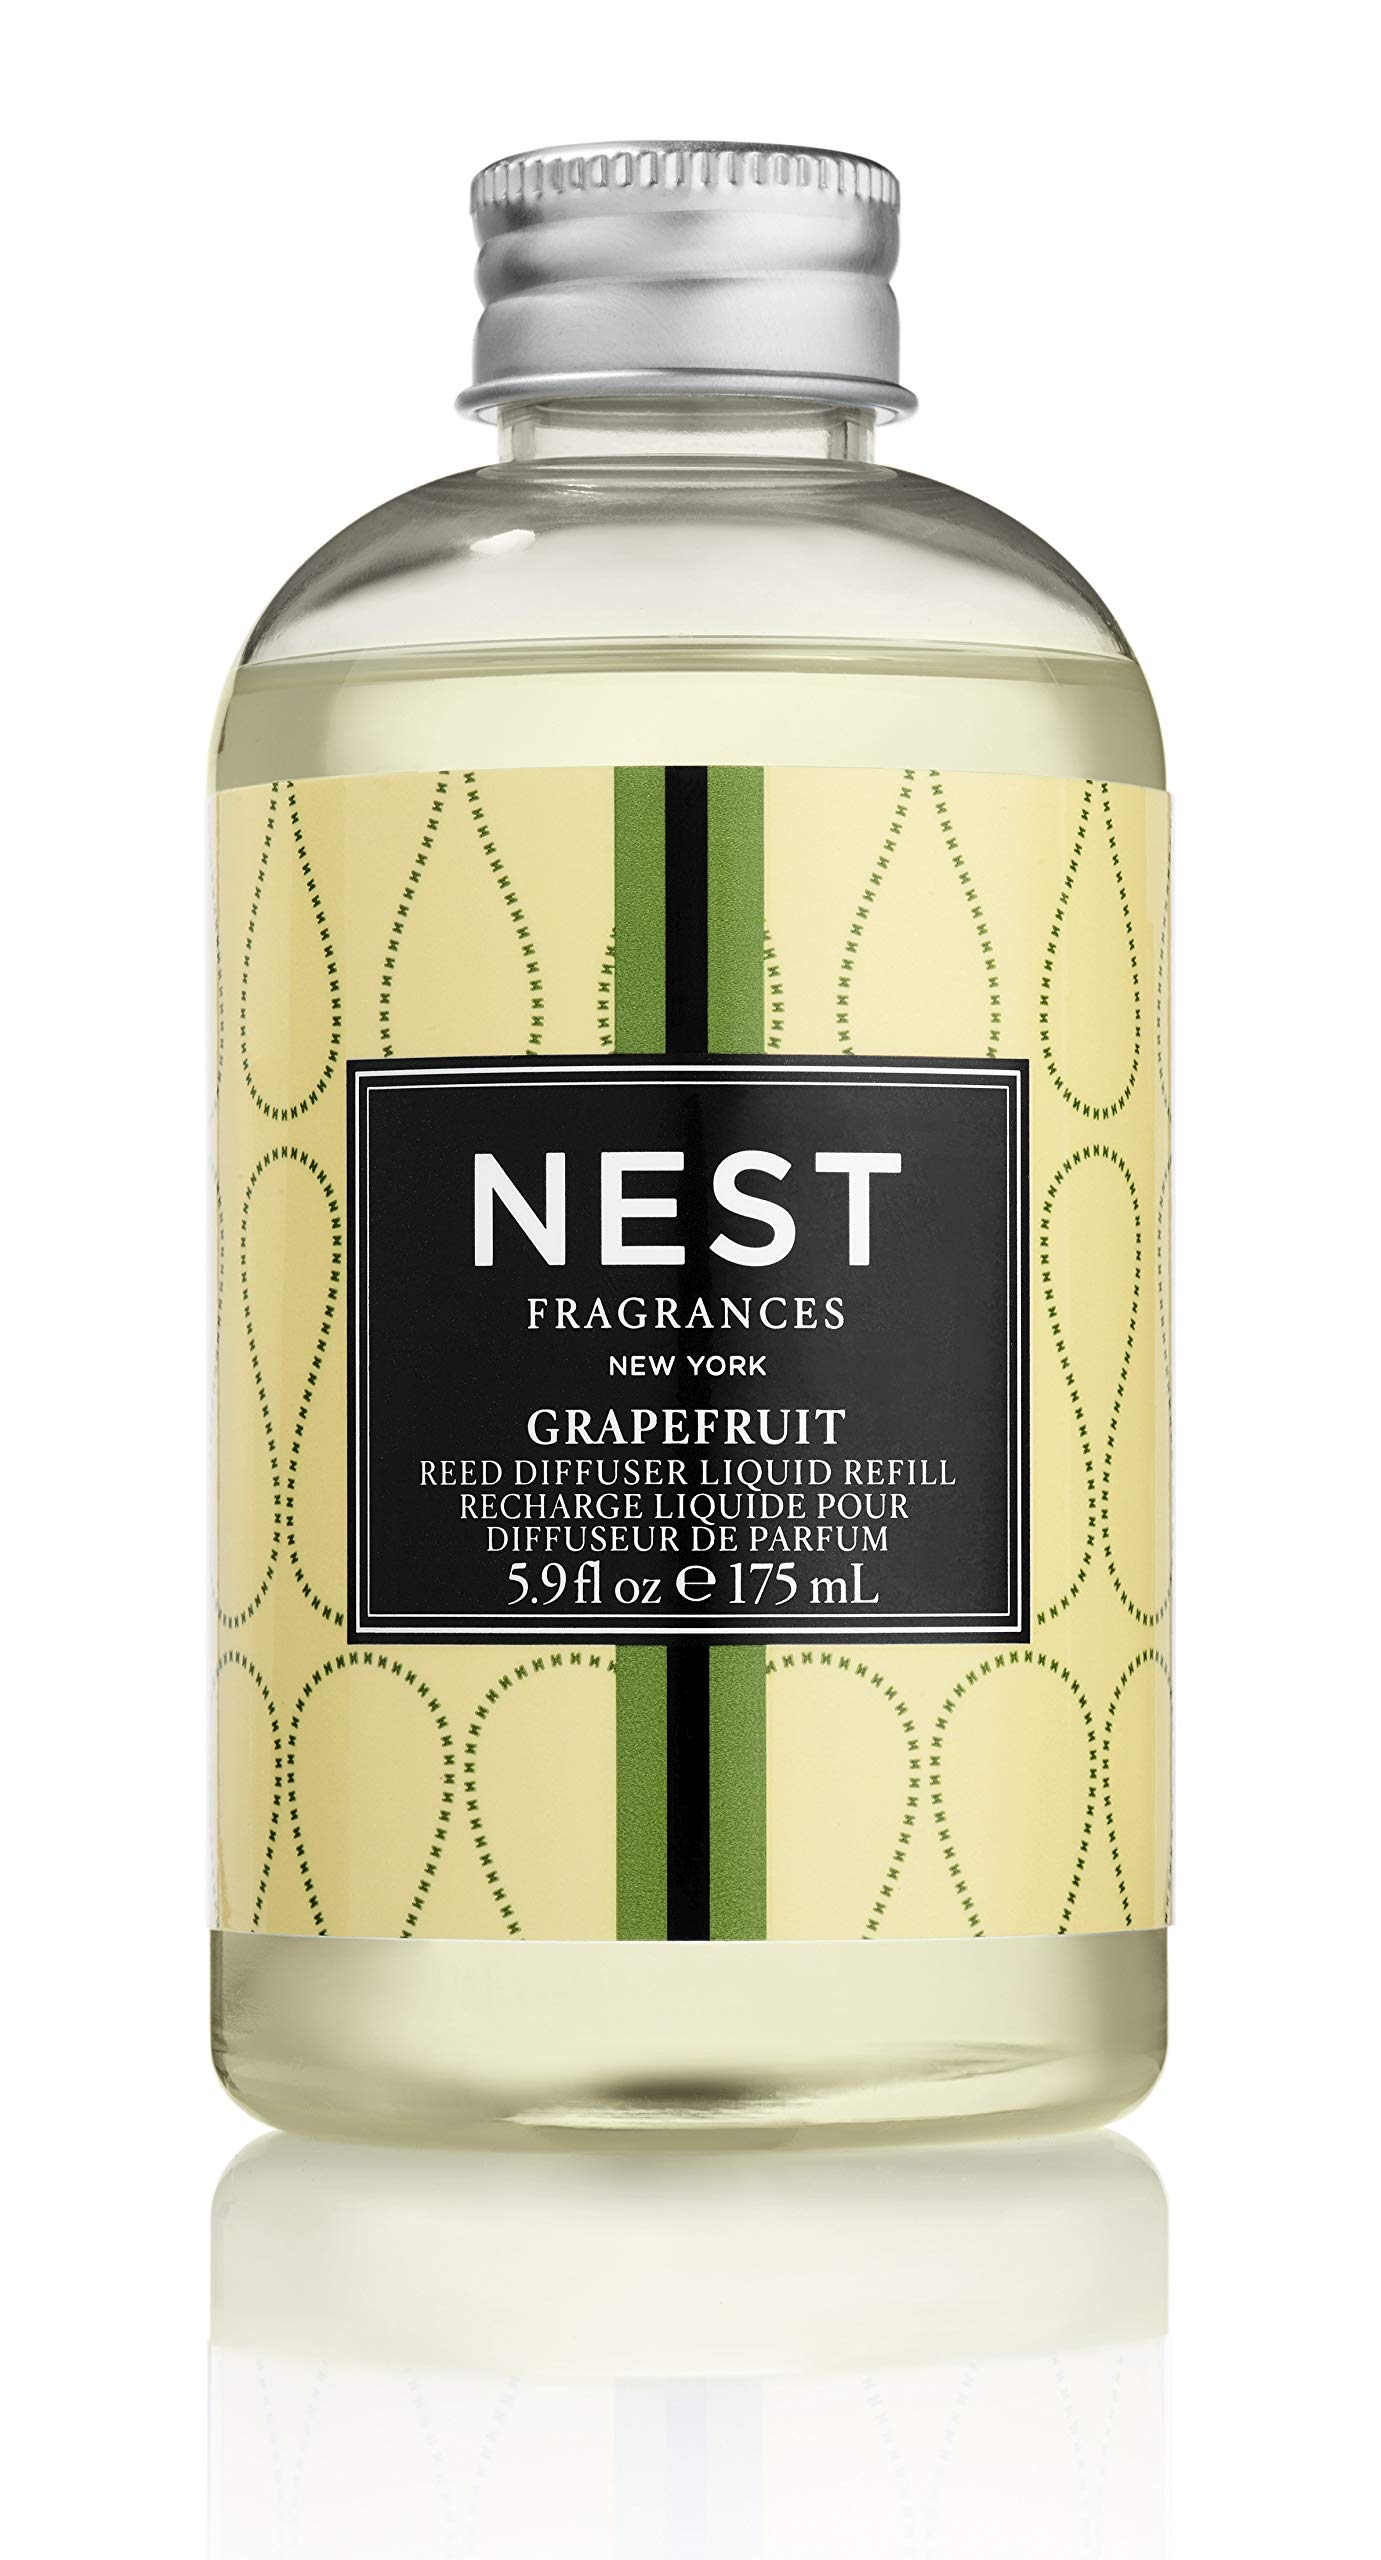 NEST Fragrances Grapefruit Reed Diffuser Liquid Refill by NEST Fragrances